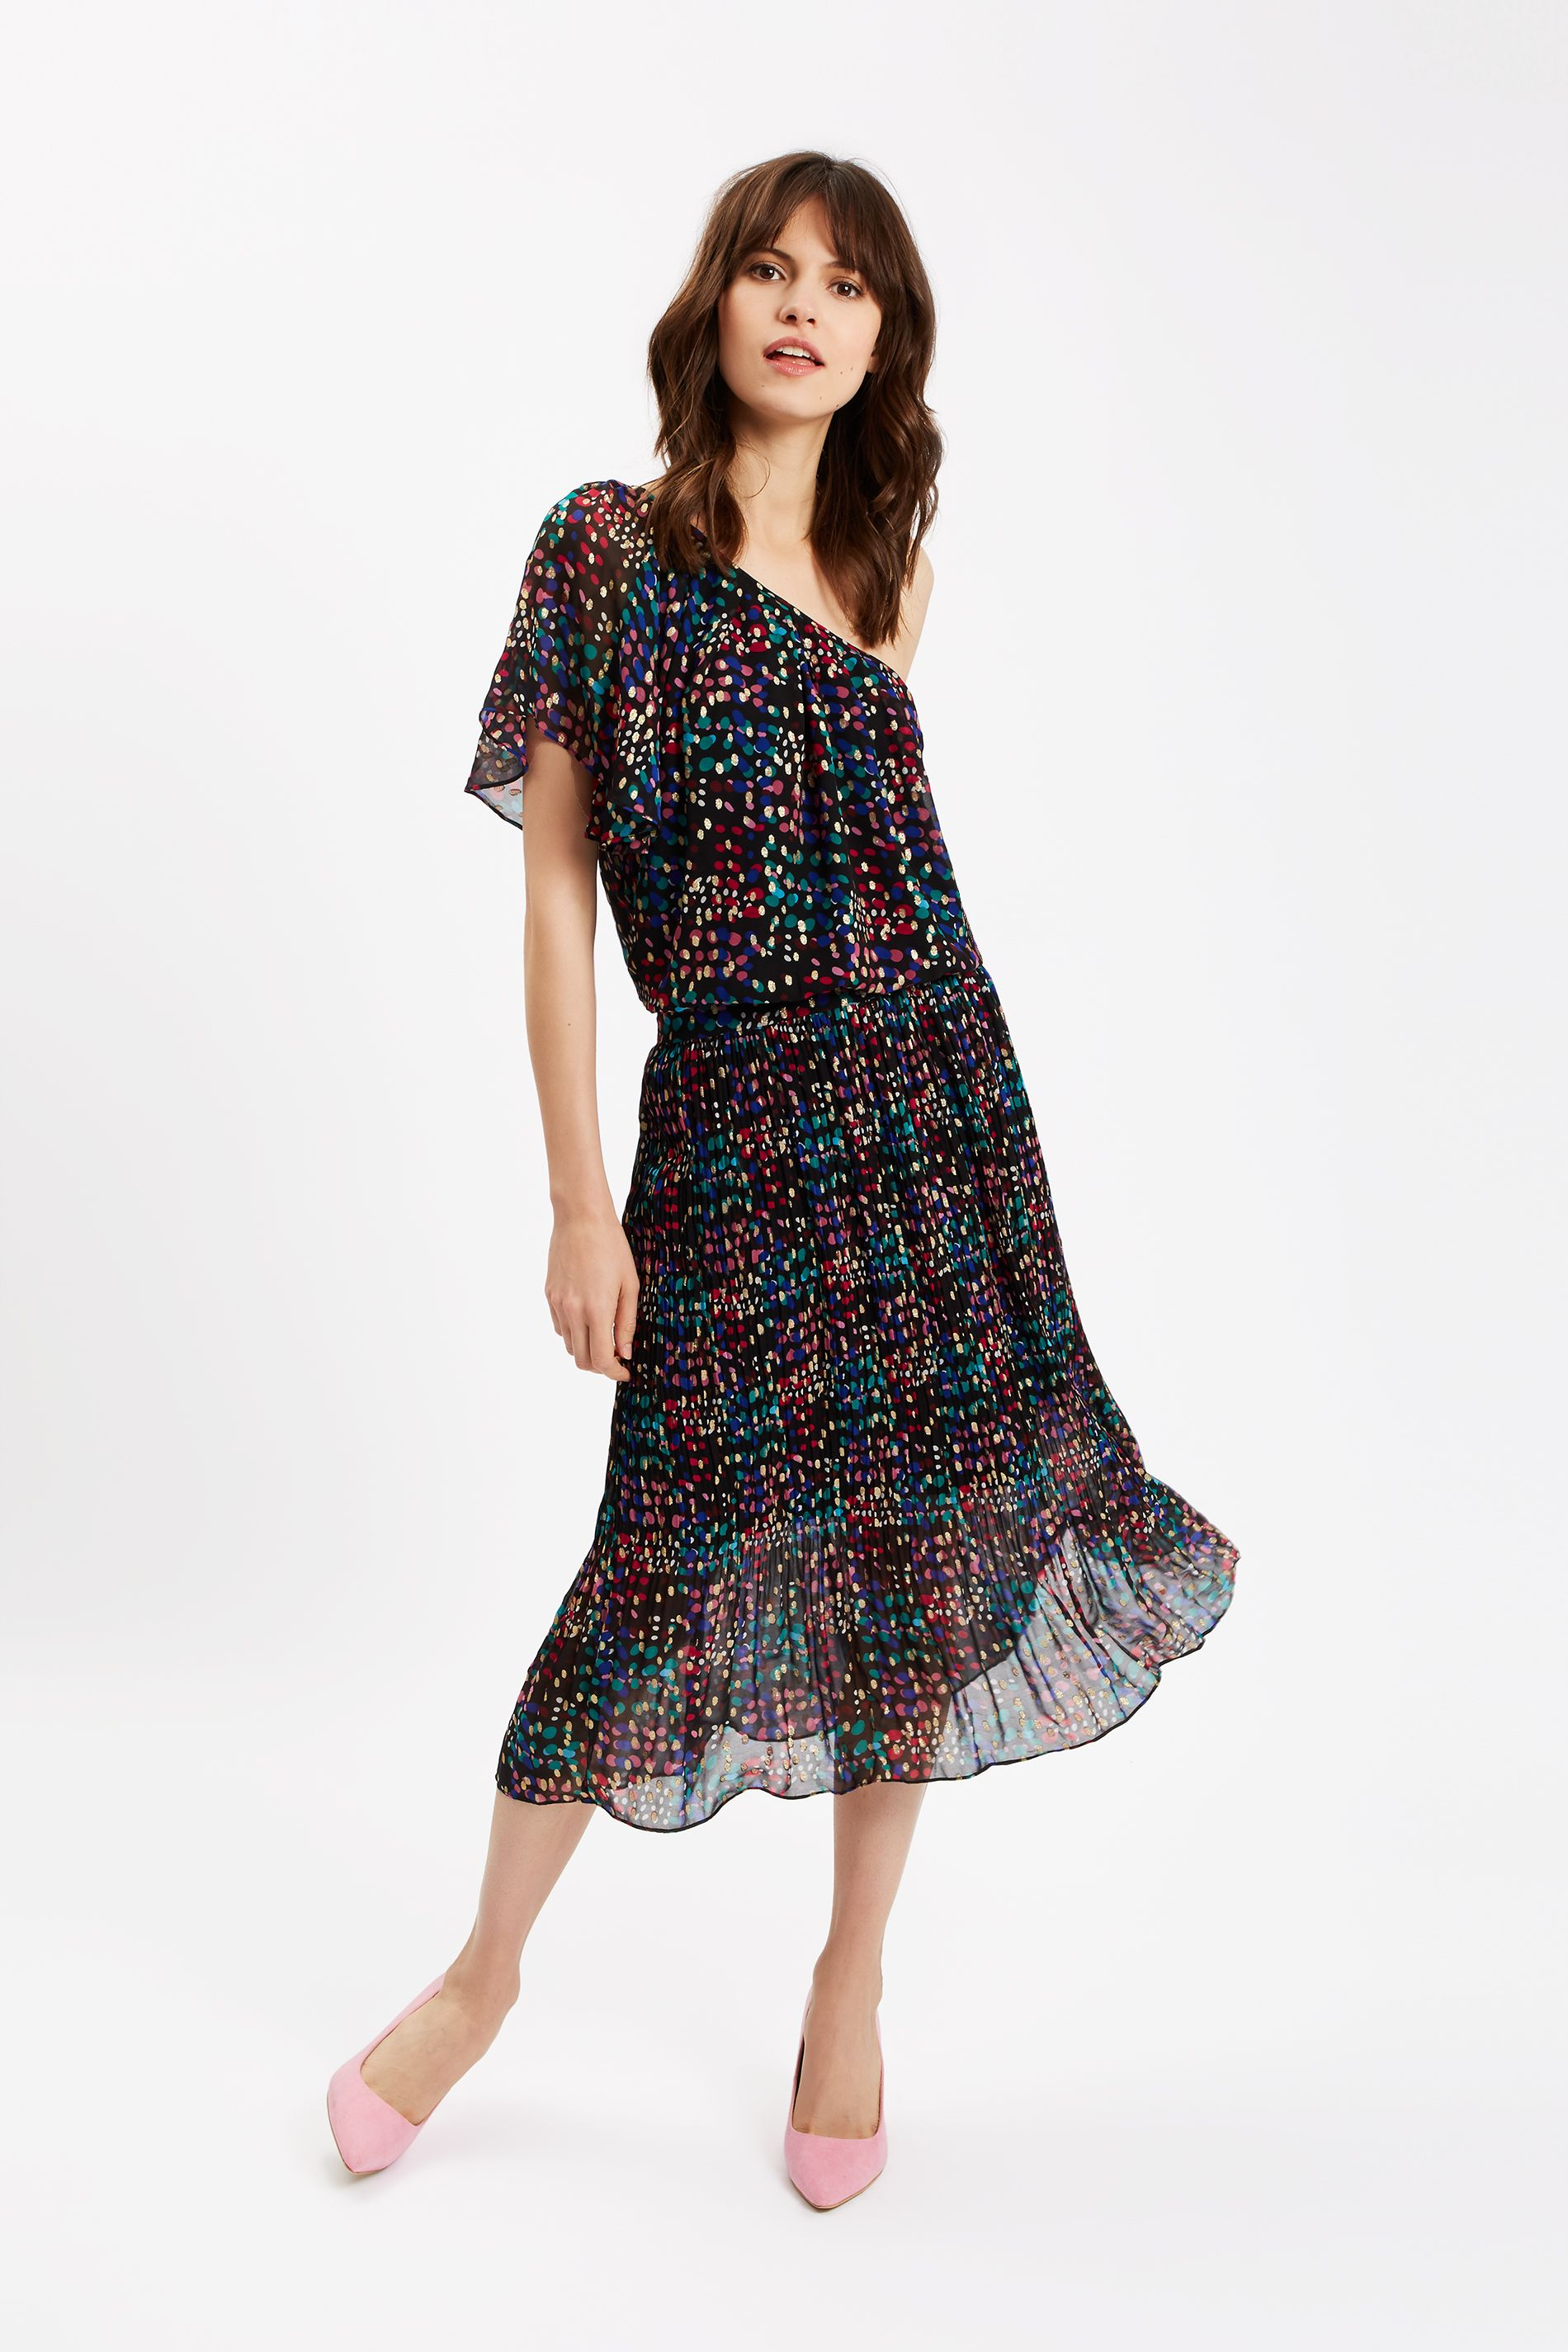 Amorous Polka Dot One Shoulder Dress in Black